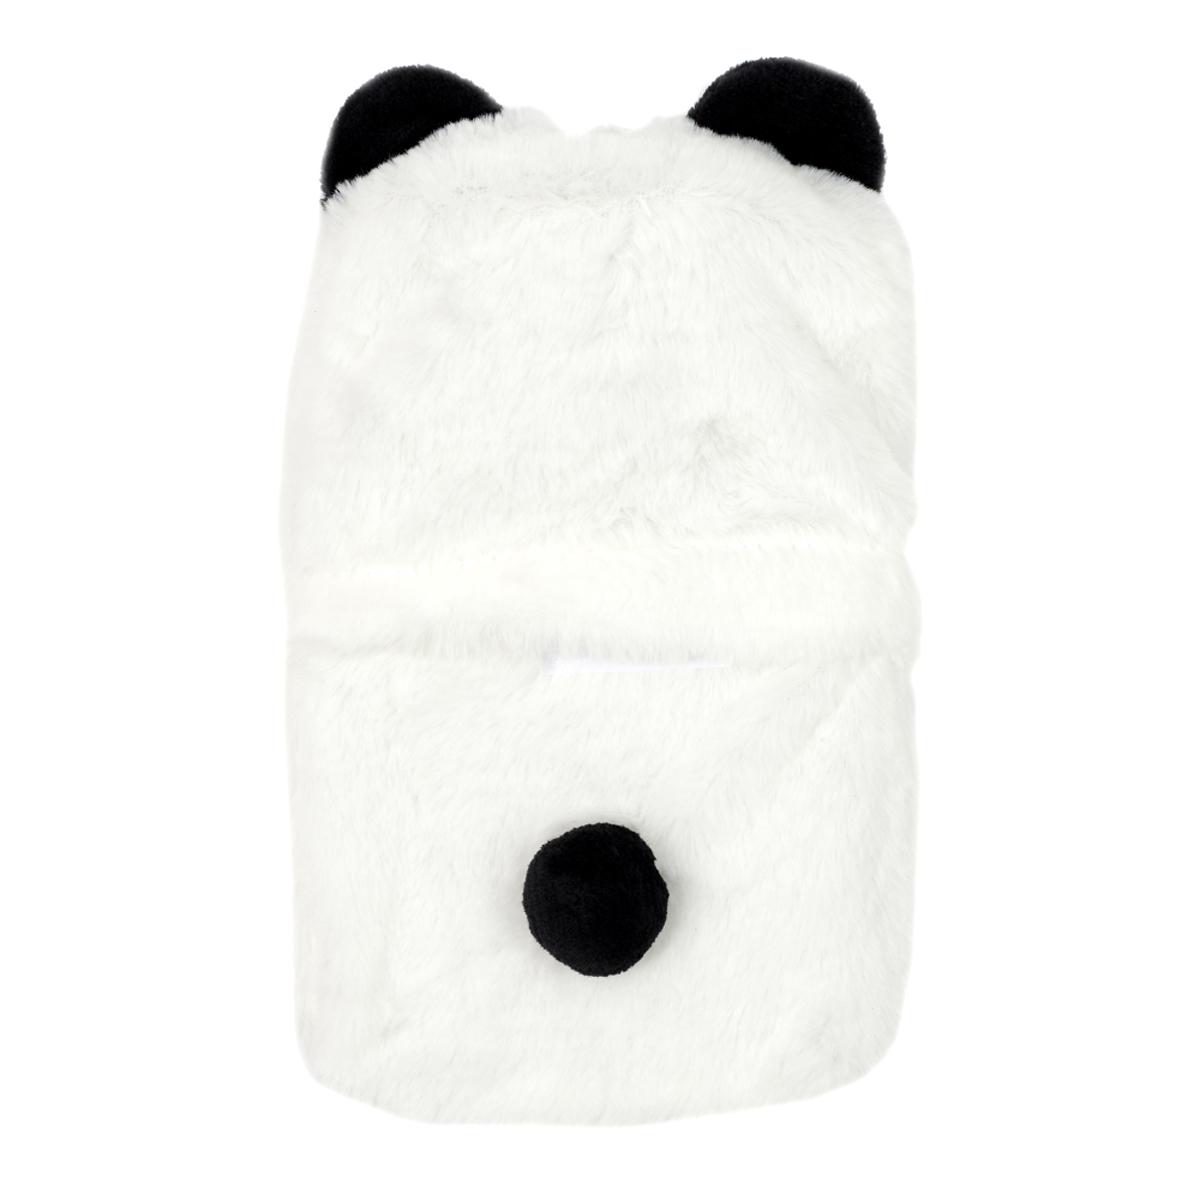 Bouillotte peluche \'Animaux\' blanc noir (panda) - 28x17 cm (1L) - [A1802]